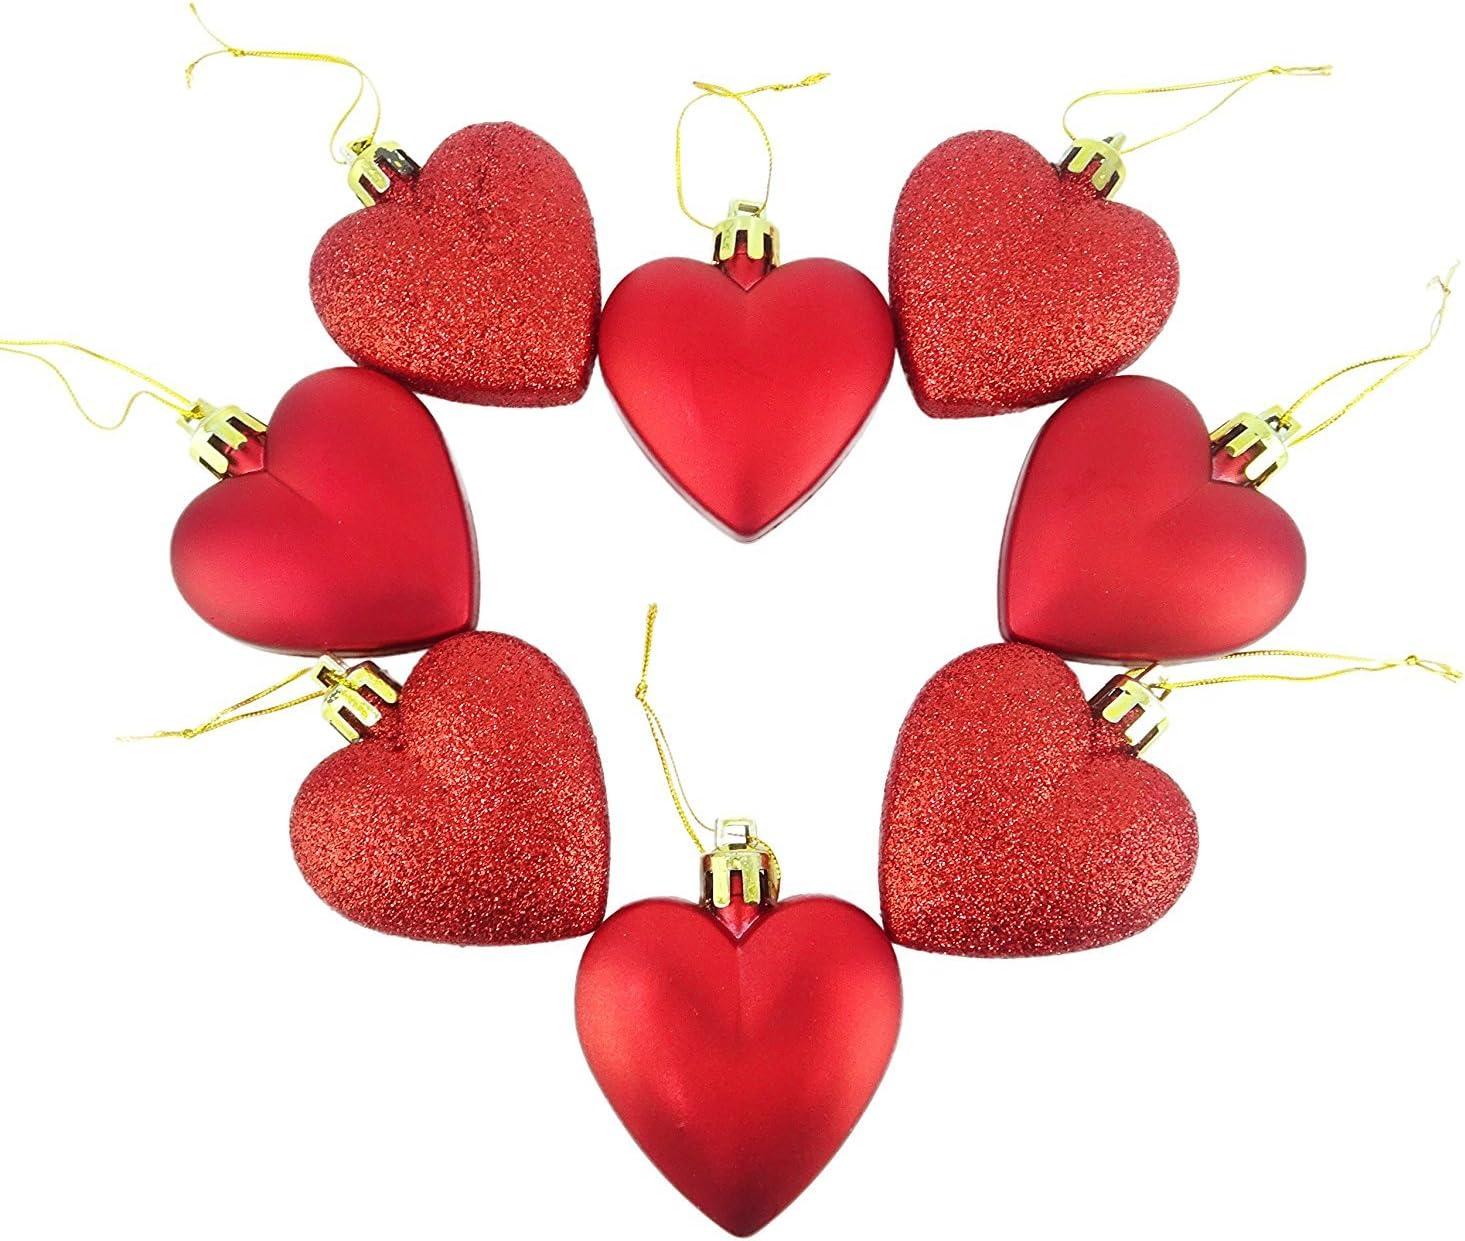 Shatterproof Heart Ornaments 8-10 Count